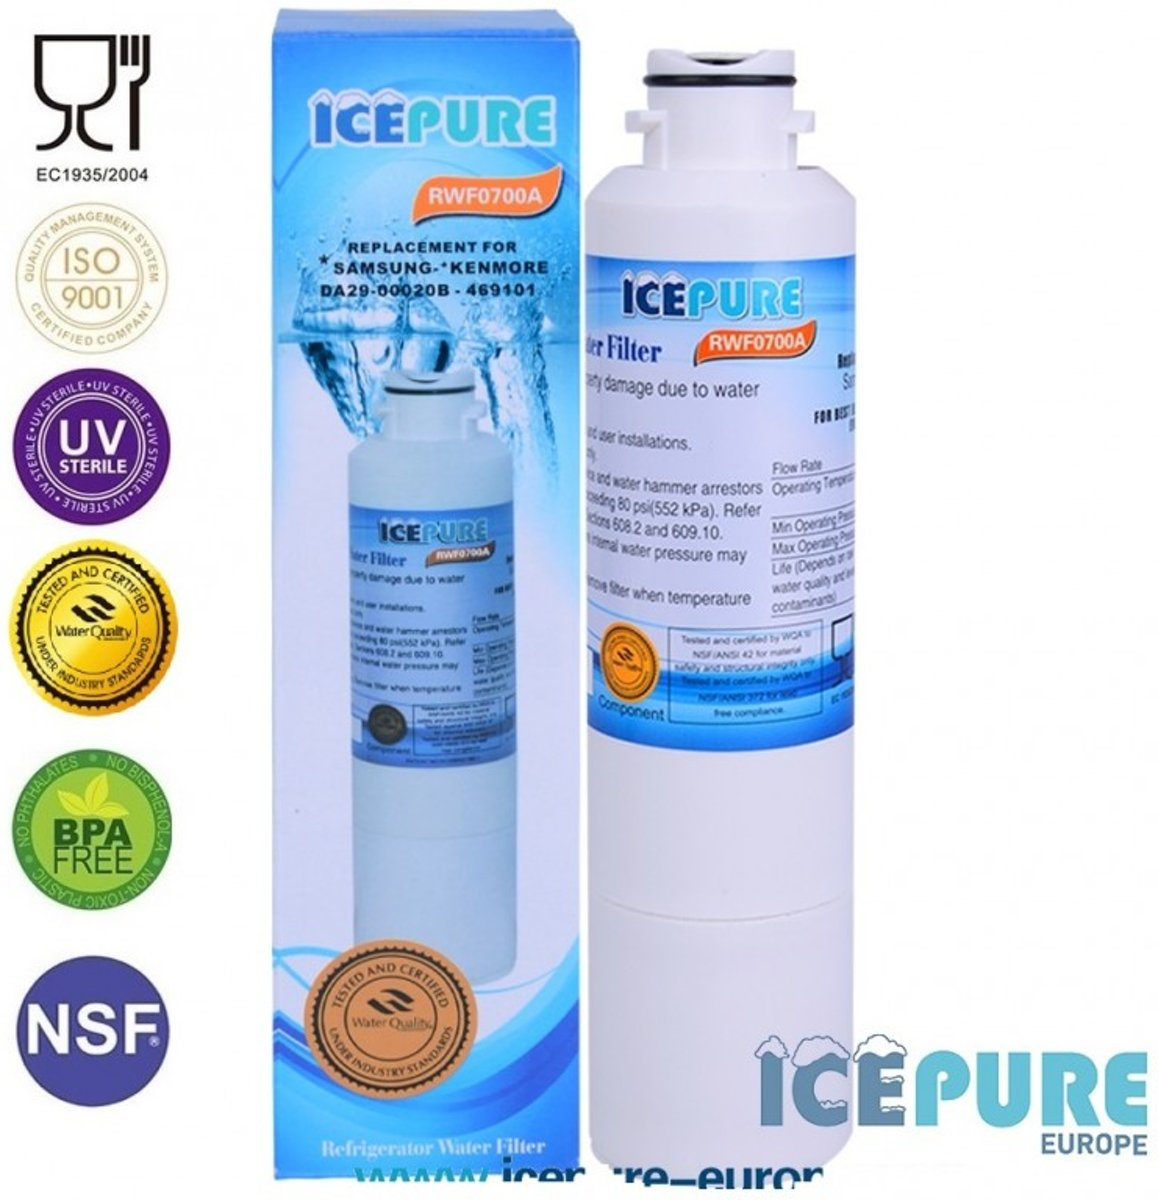 Samsung DA29-00020B Waterfilter van Icepure RWF0700A kopen